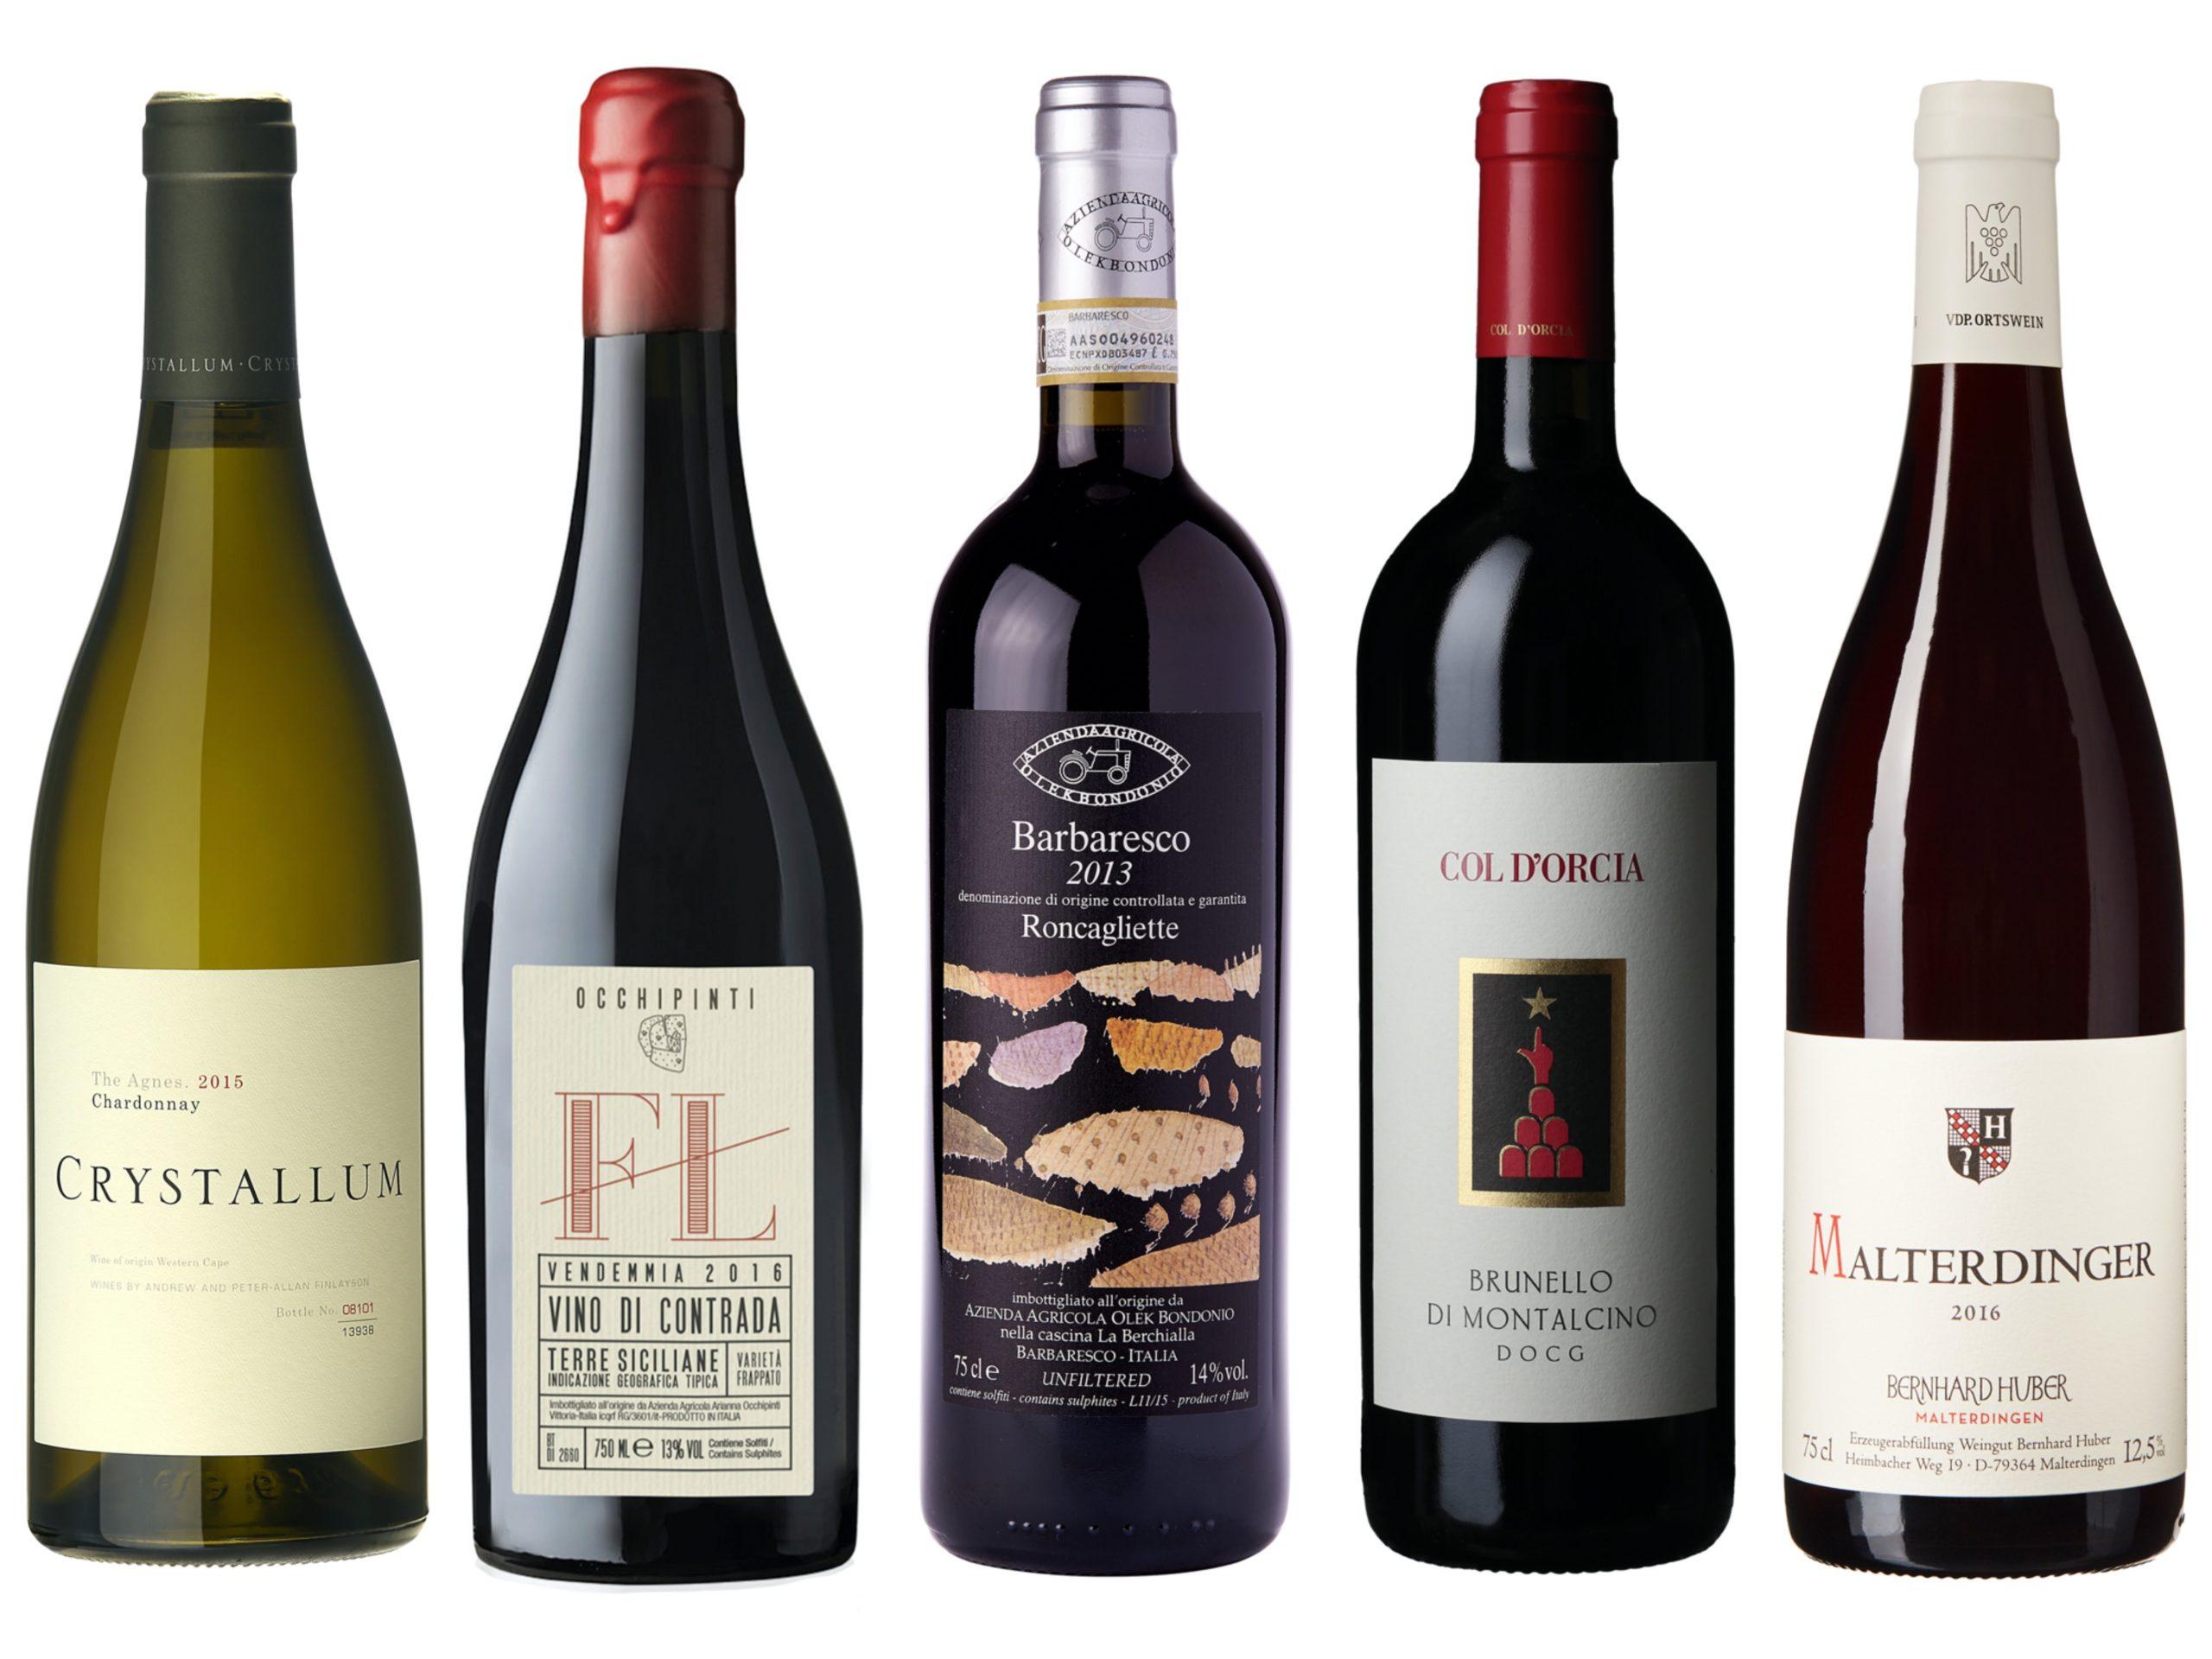 Vanskelige tider for vinbransjen – Support Quality #1